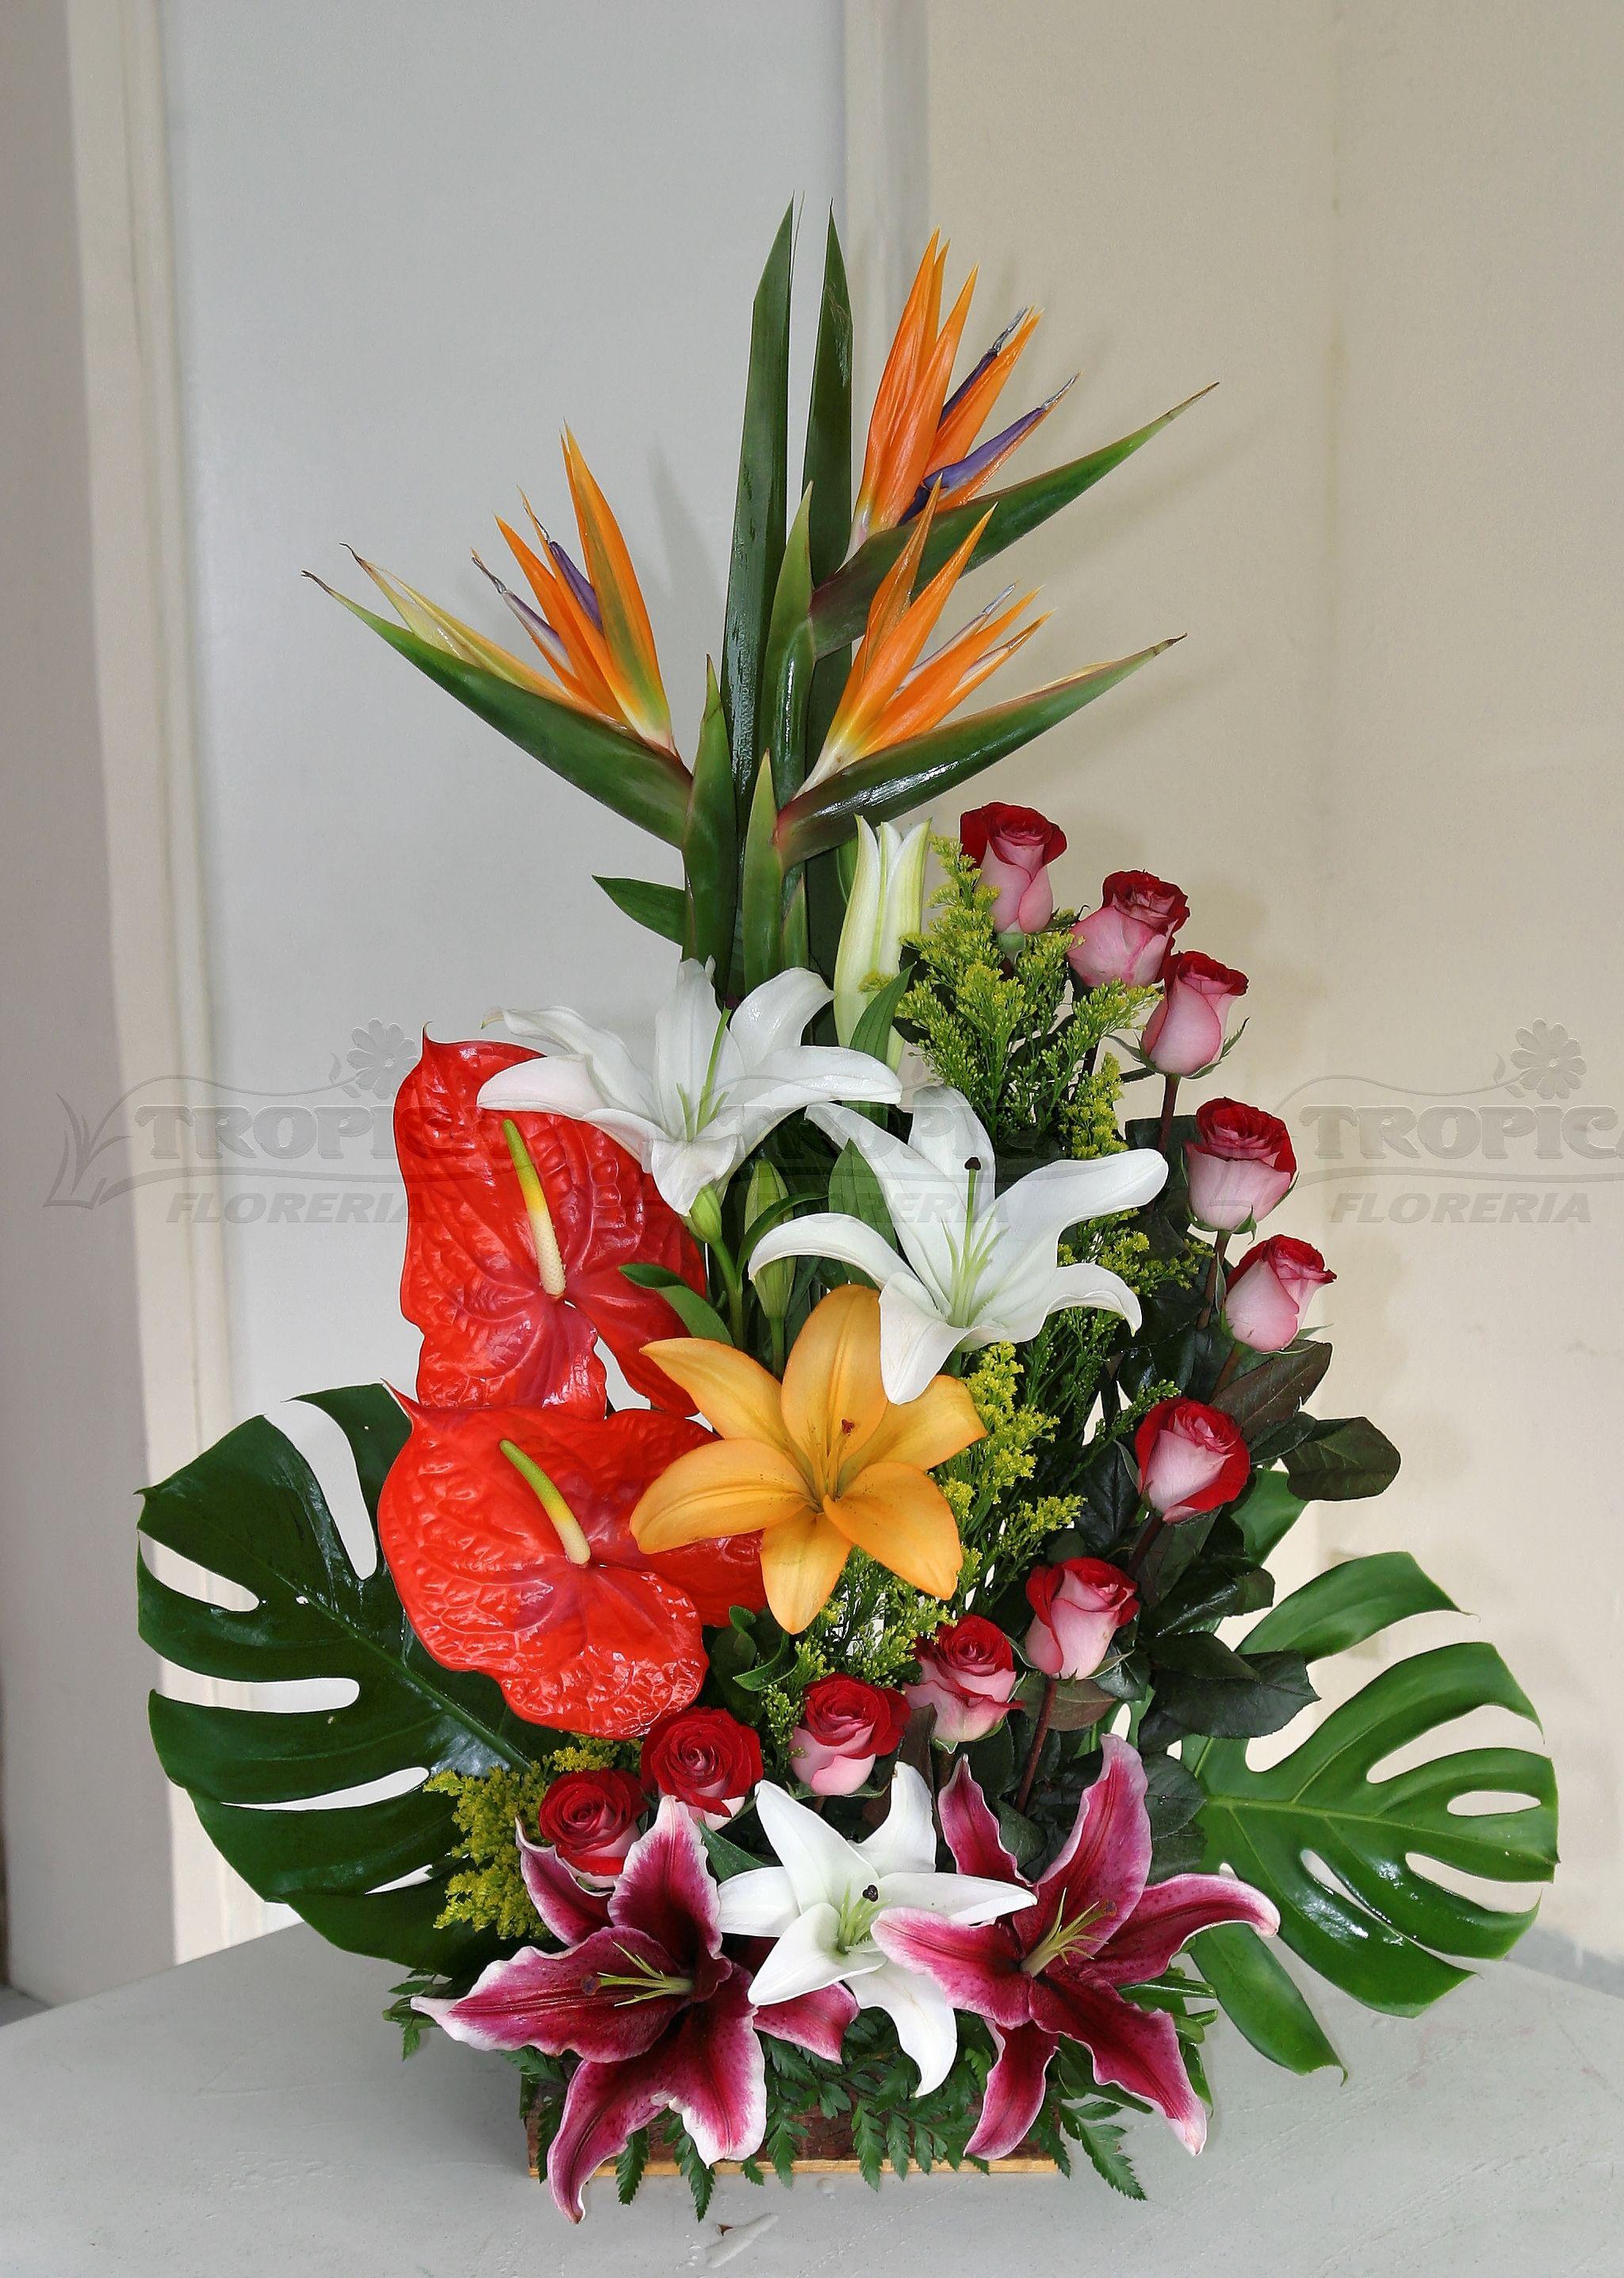 Pin By Cybil On Floral Design Pinterest Flower Arrangements